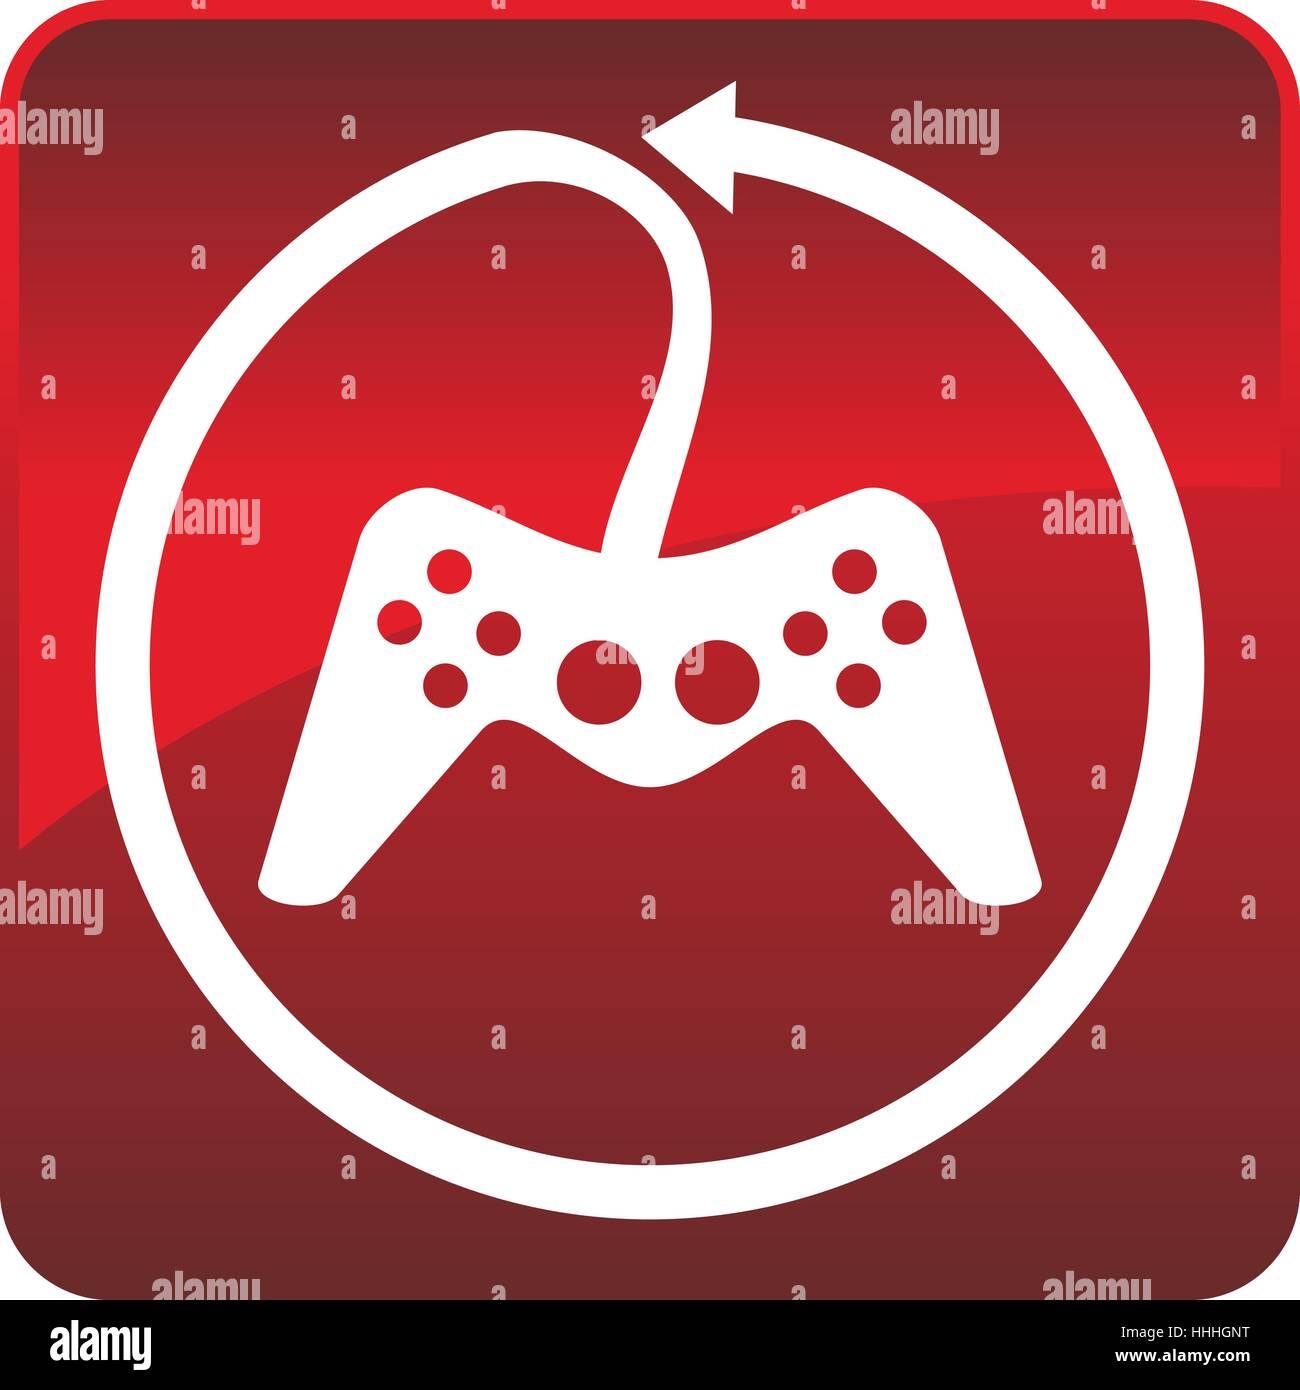 Game Joystick Logo - Stock Image